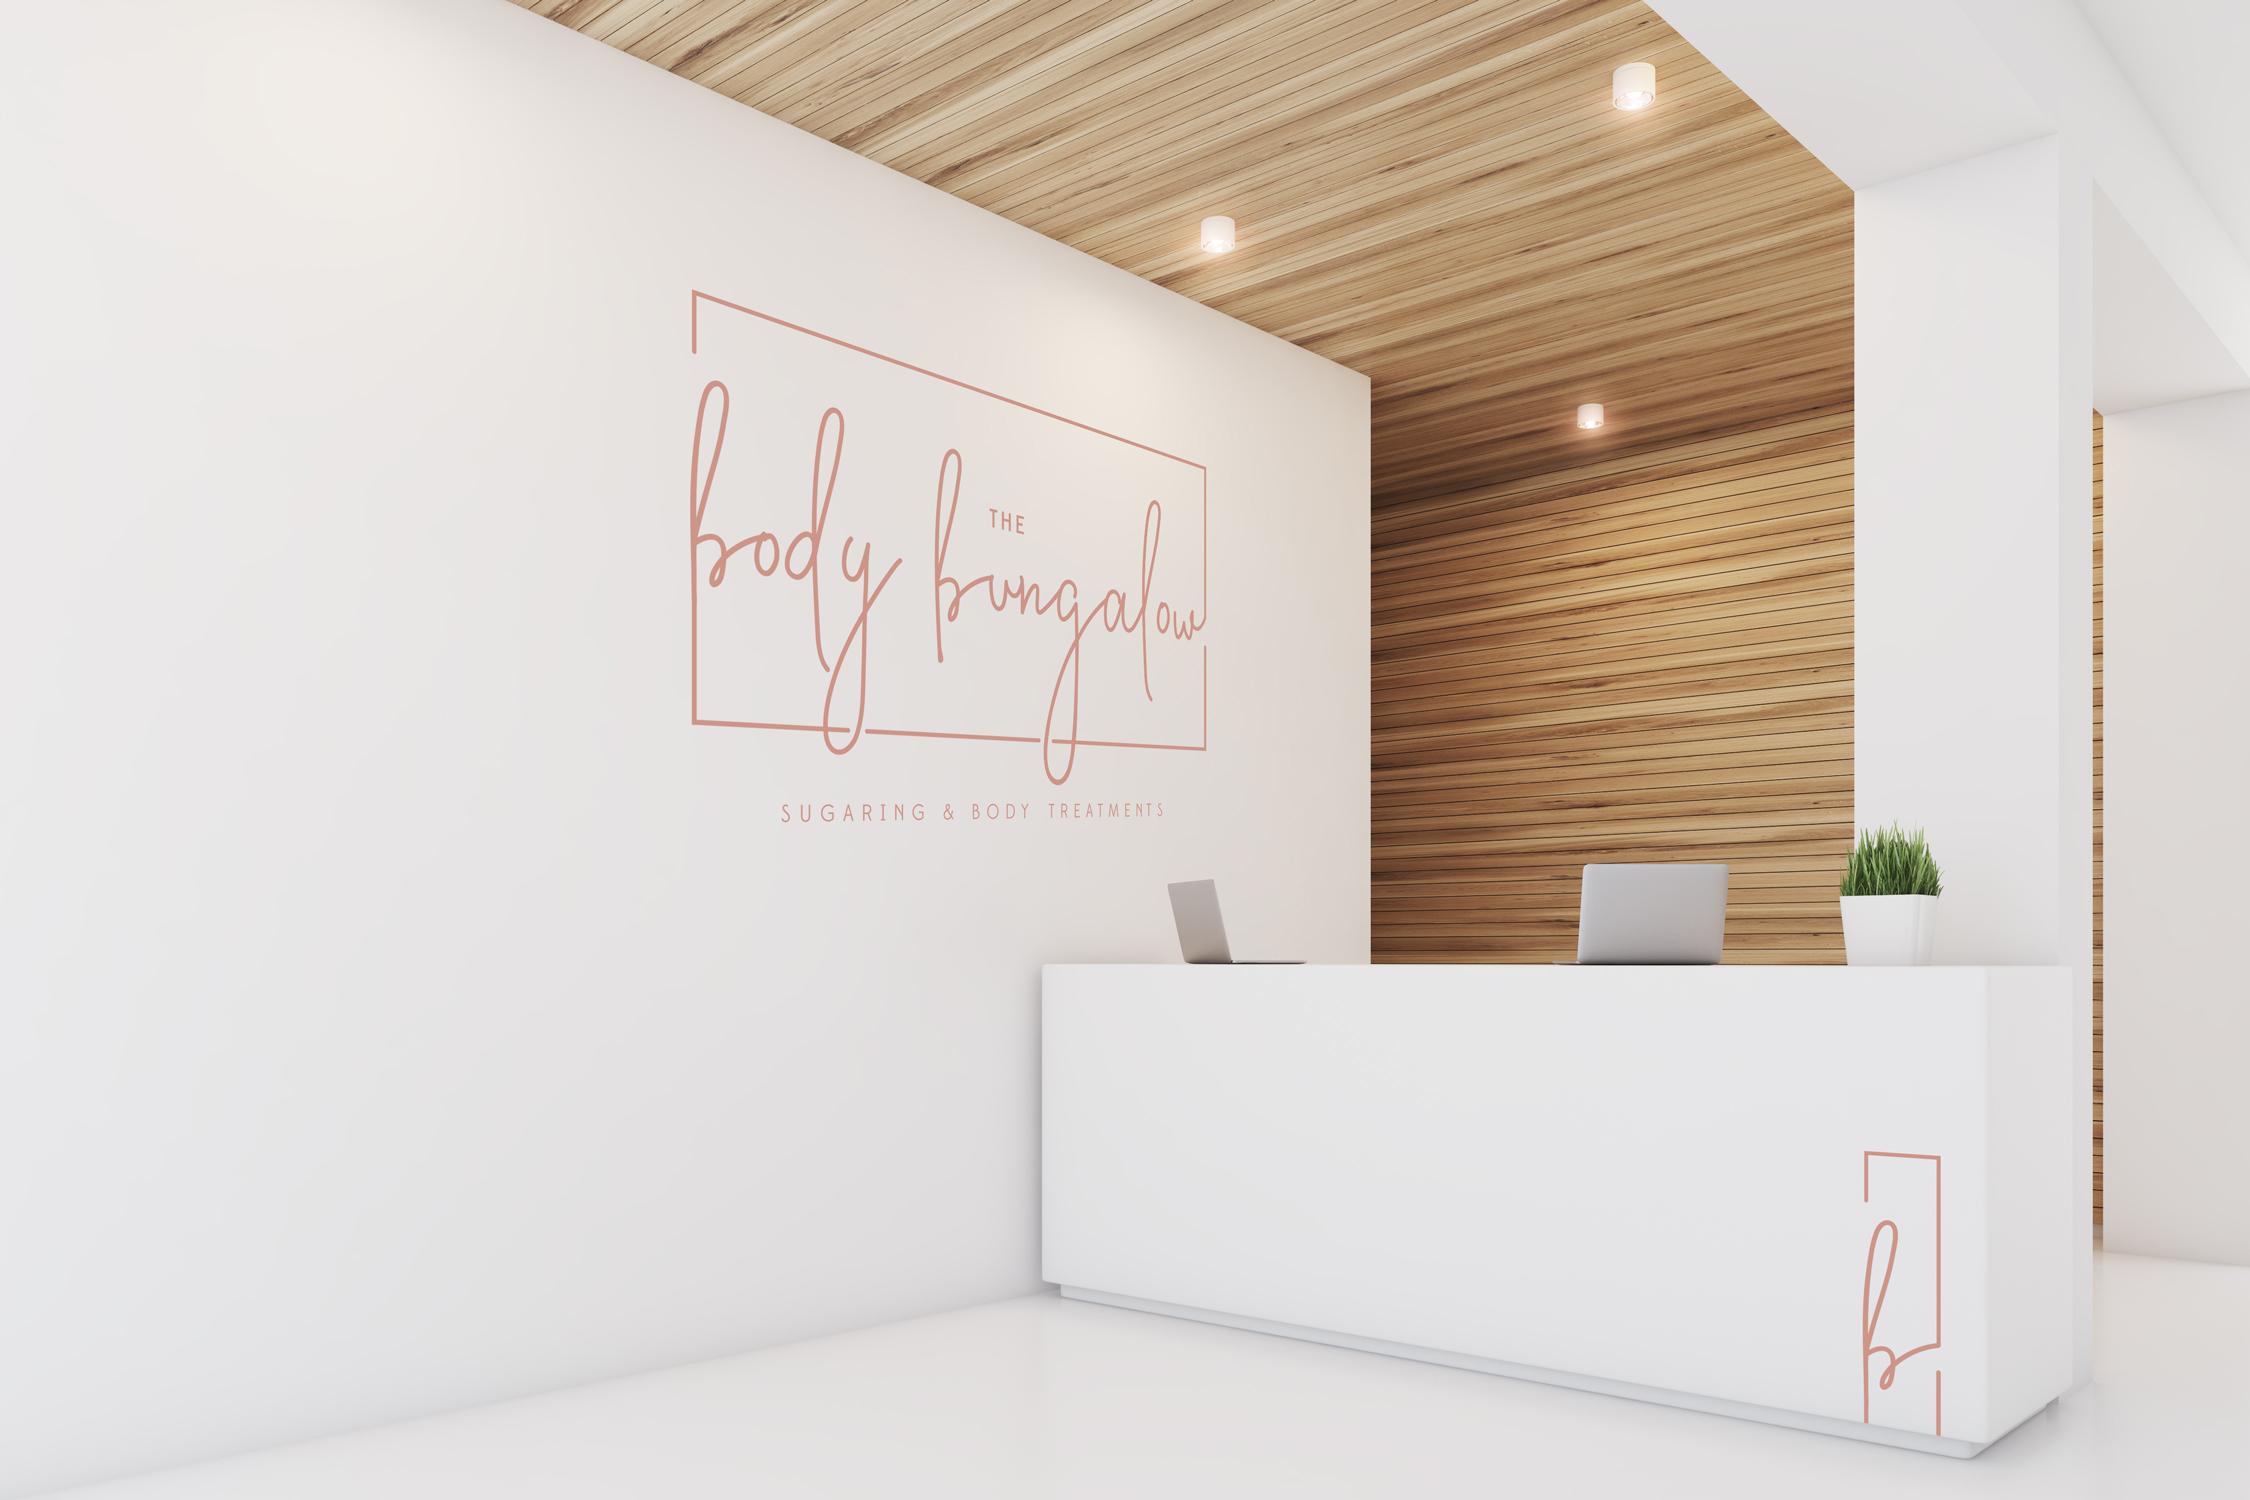 BodyBungalow_InStore.jpg